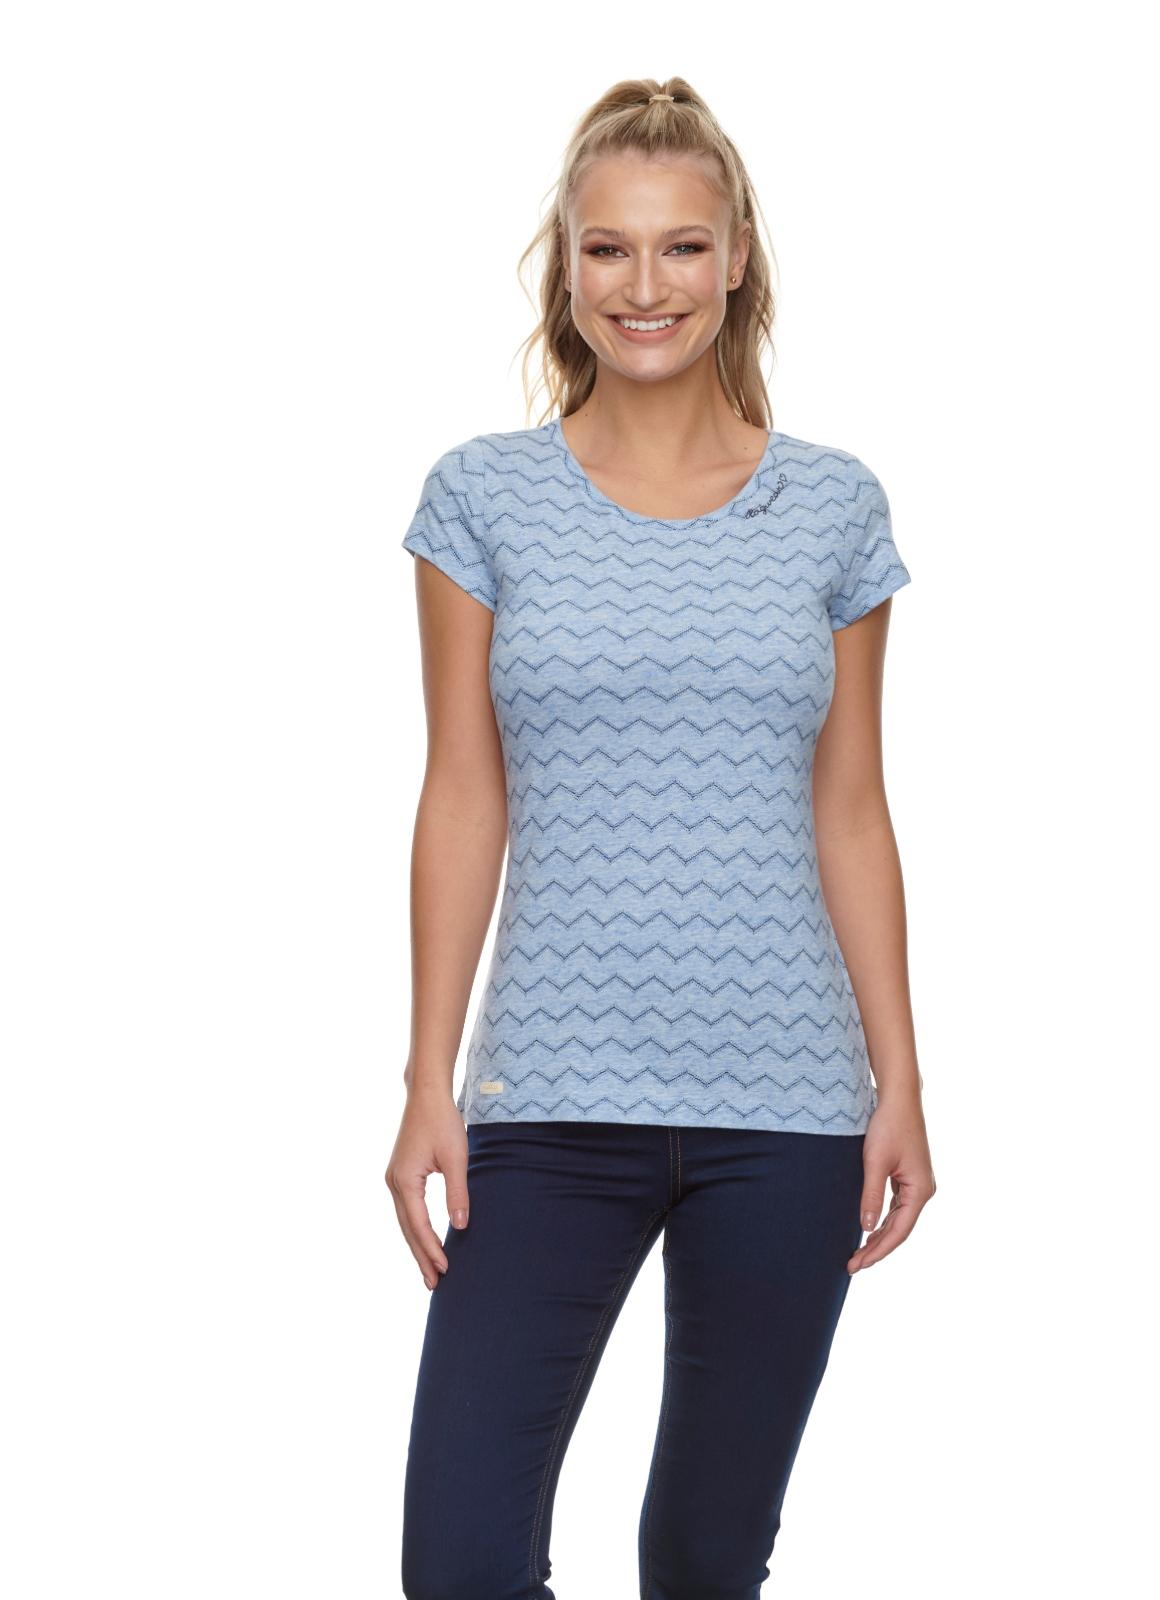 Ragwear Damen T-Shirt Mint Chevron blau weiß gemustert 2111 10014 2040 blue